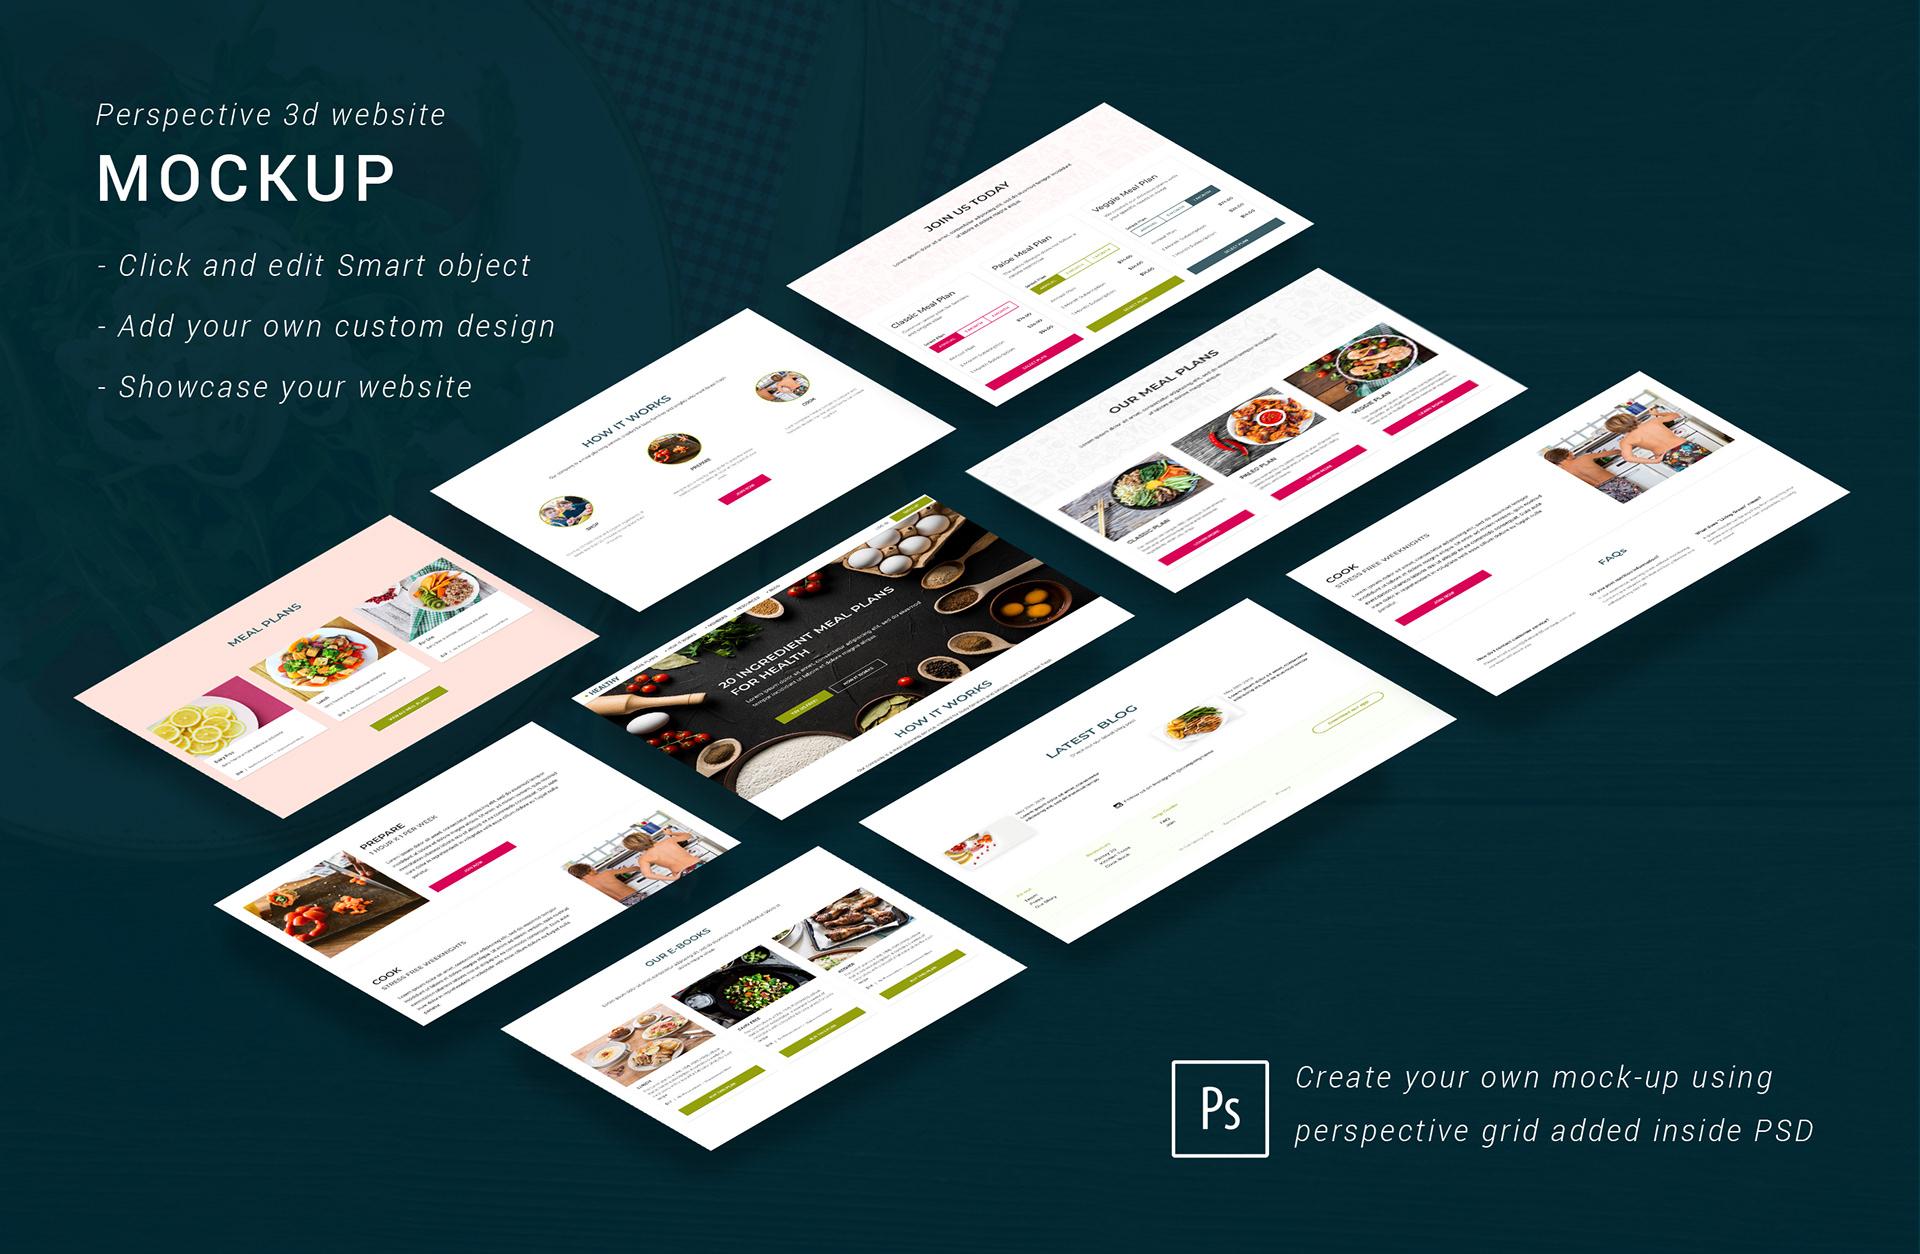 30+ Perspective Website Design PSD Mockups   Decolore Net